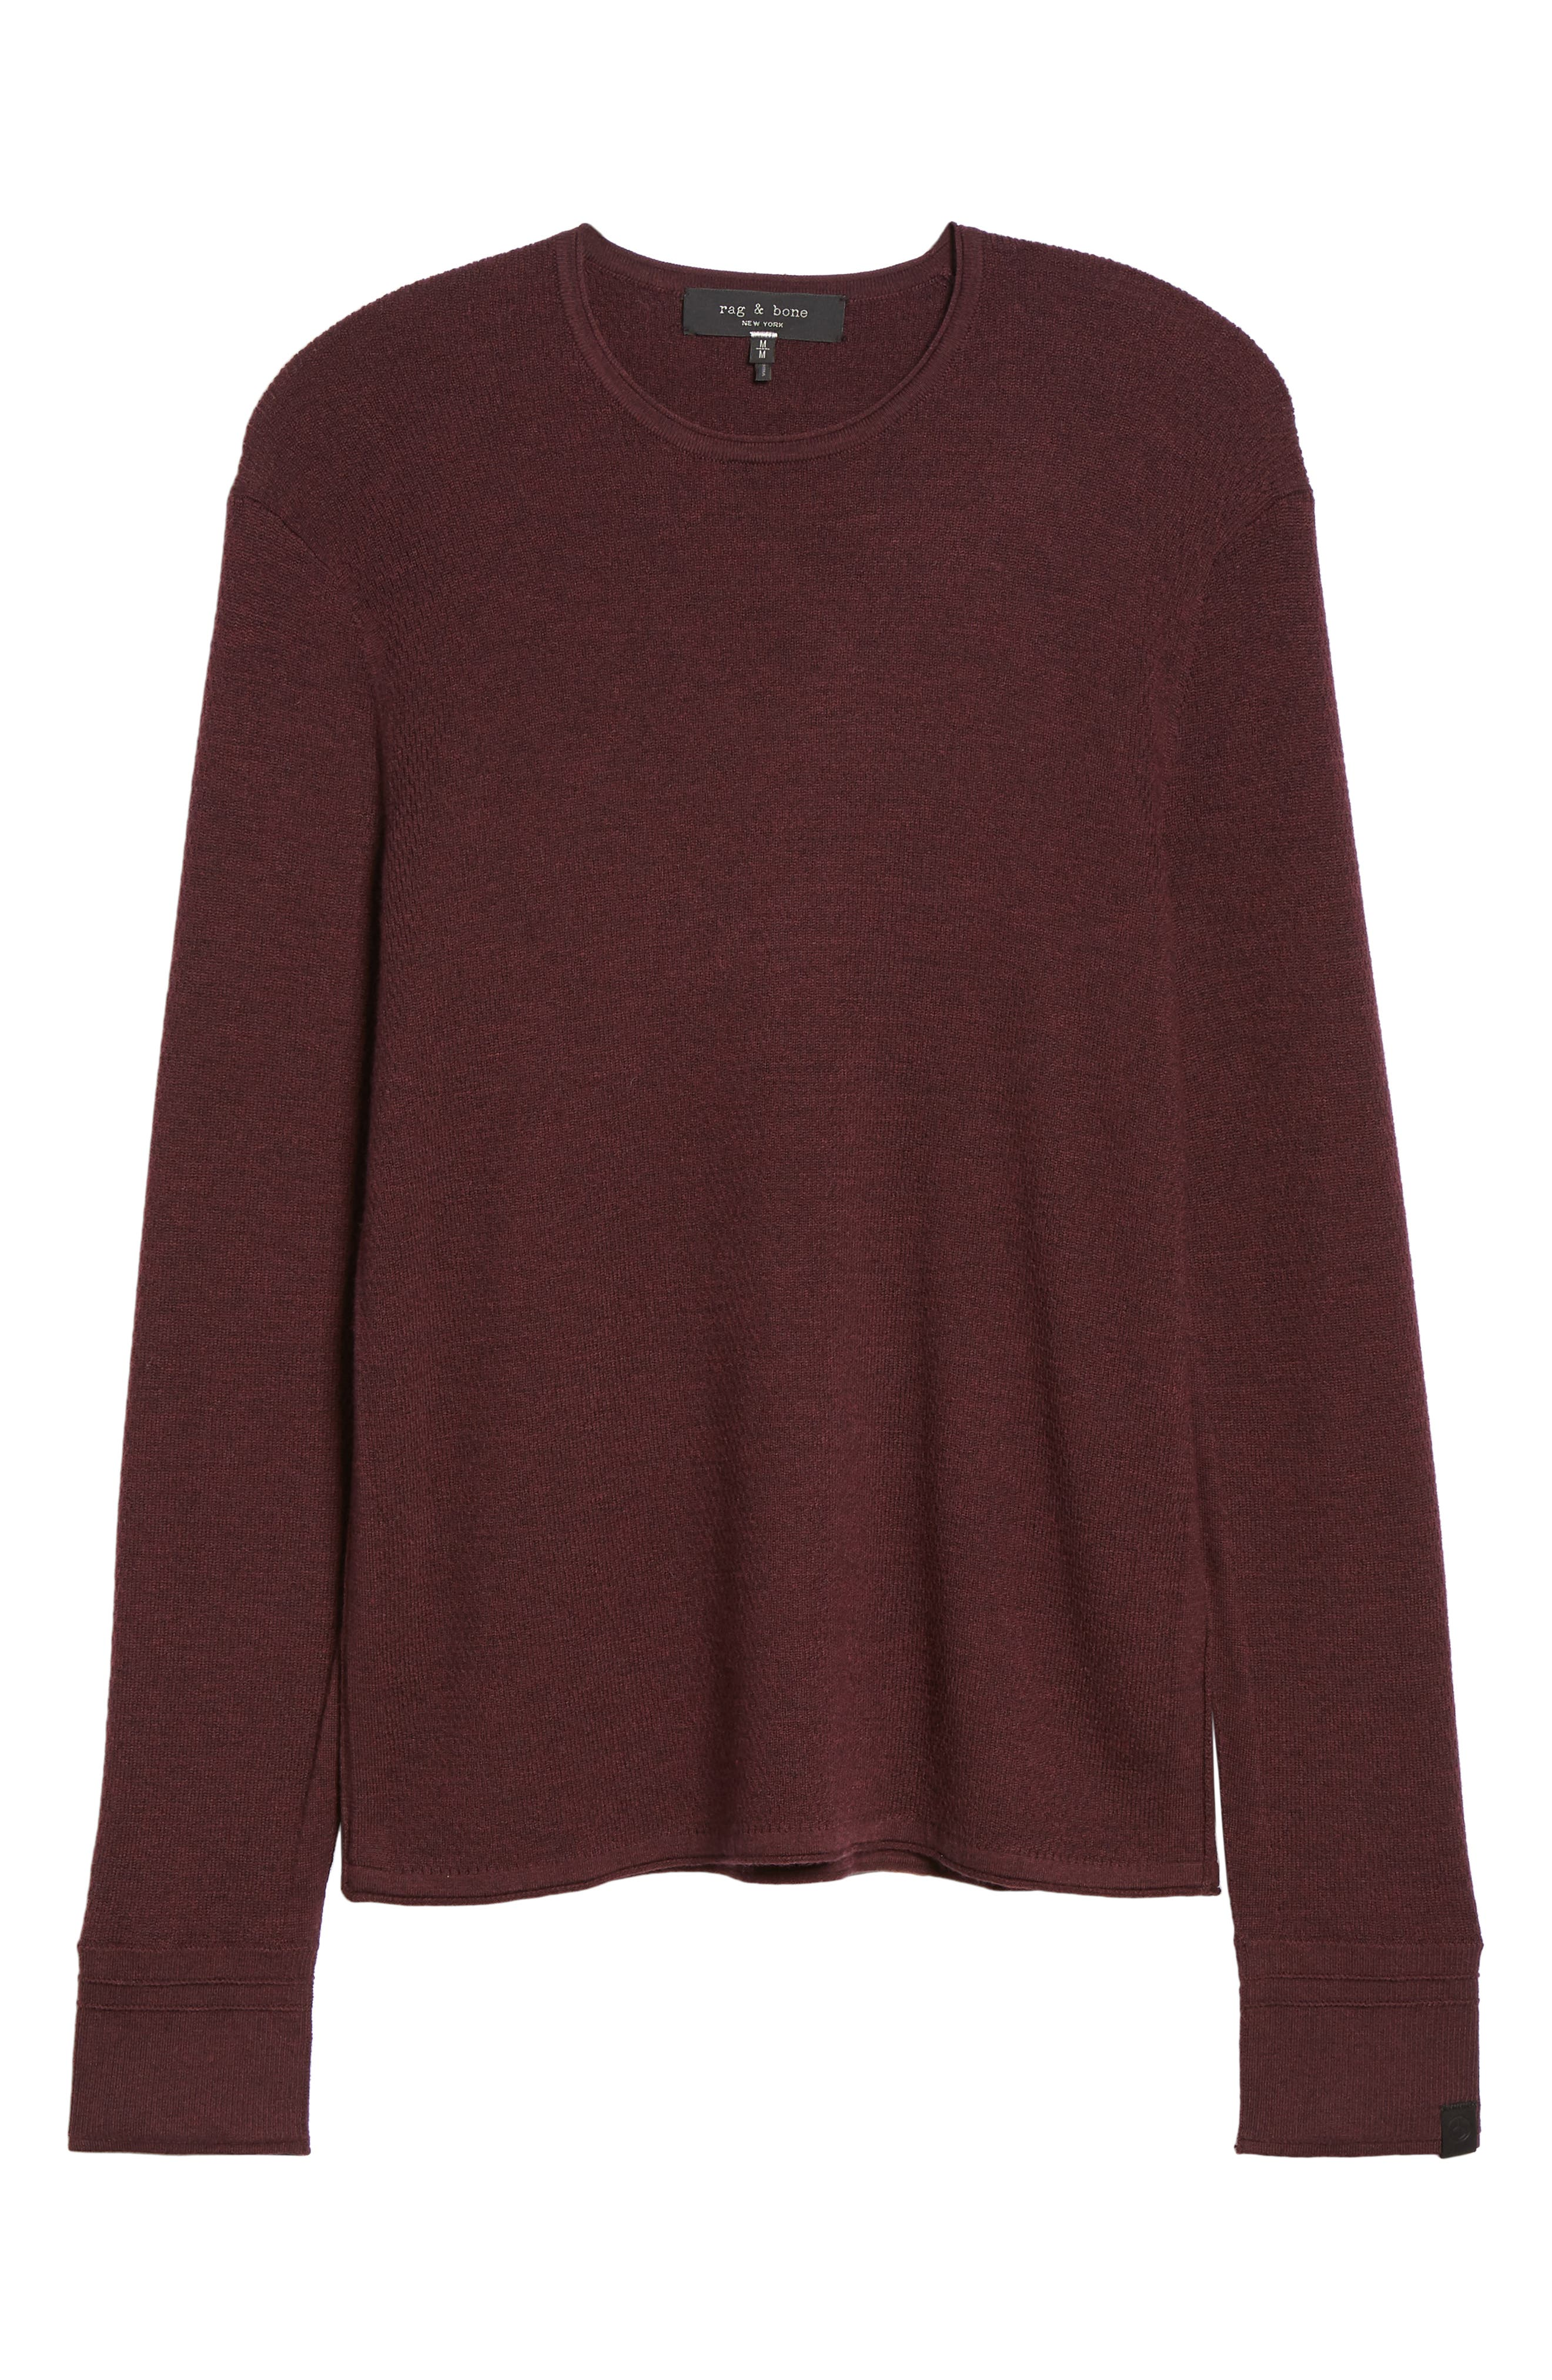 Gregory Merino Wool Blend Crewneck Sweater,                             Alternate thumbnail 6, color,                             BURGUNDY